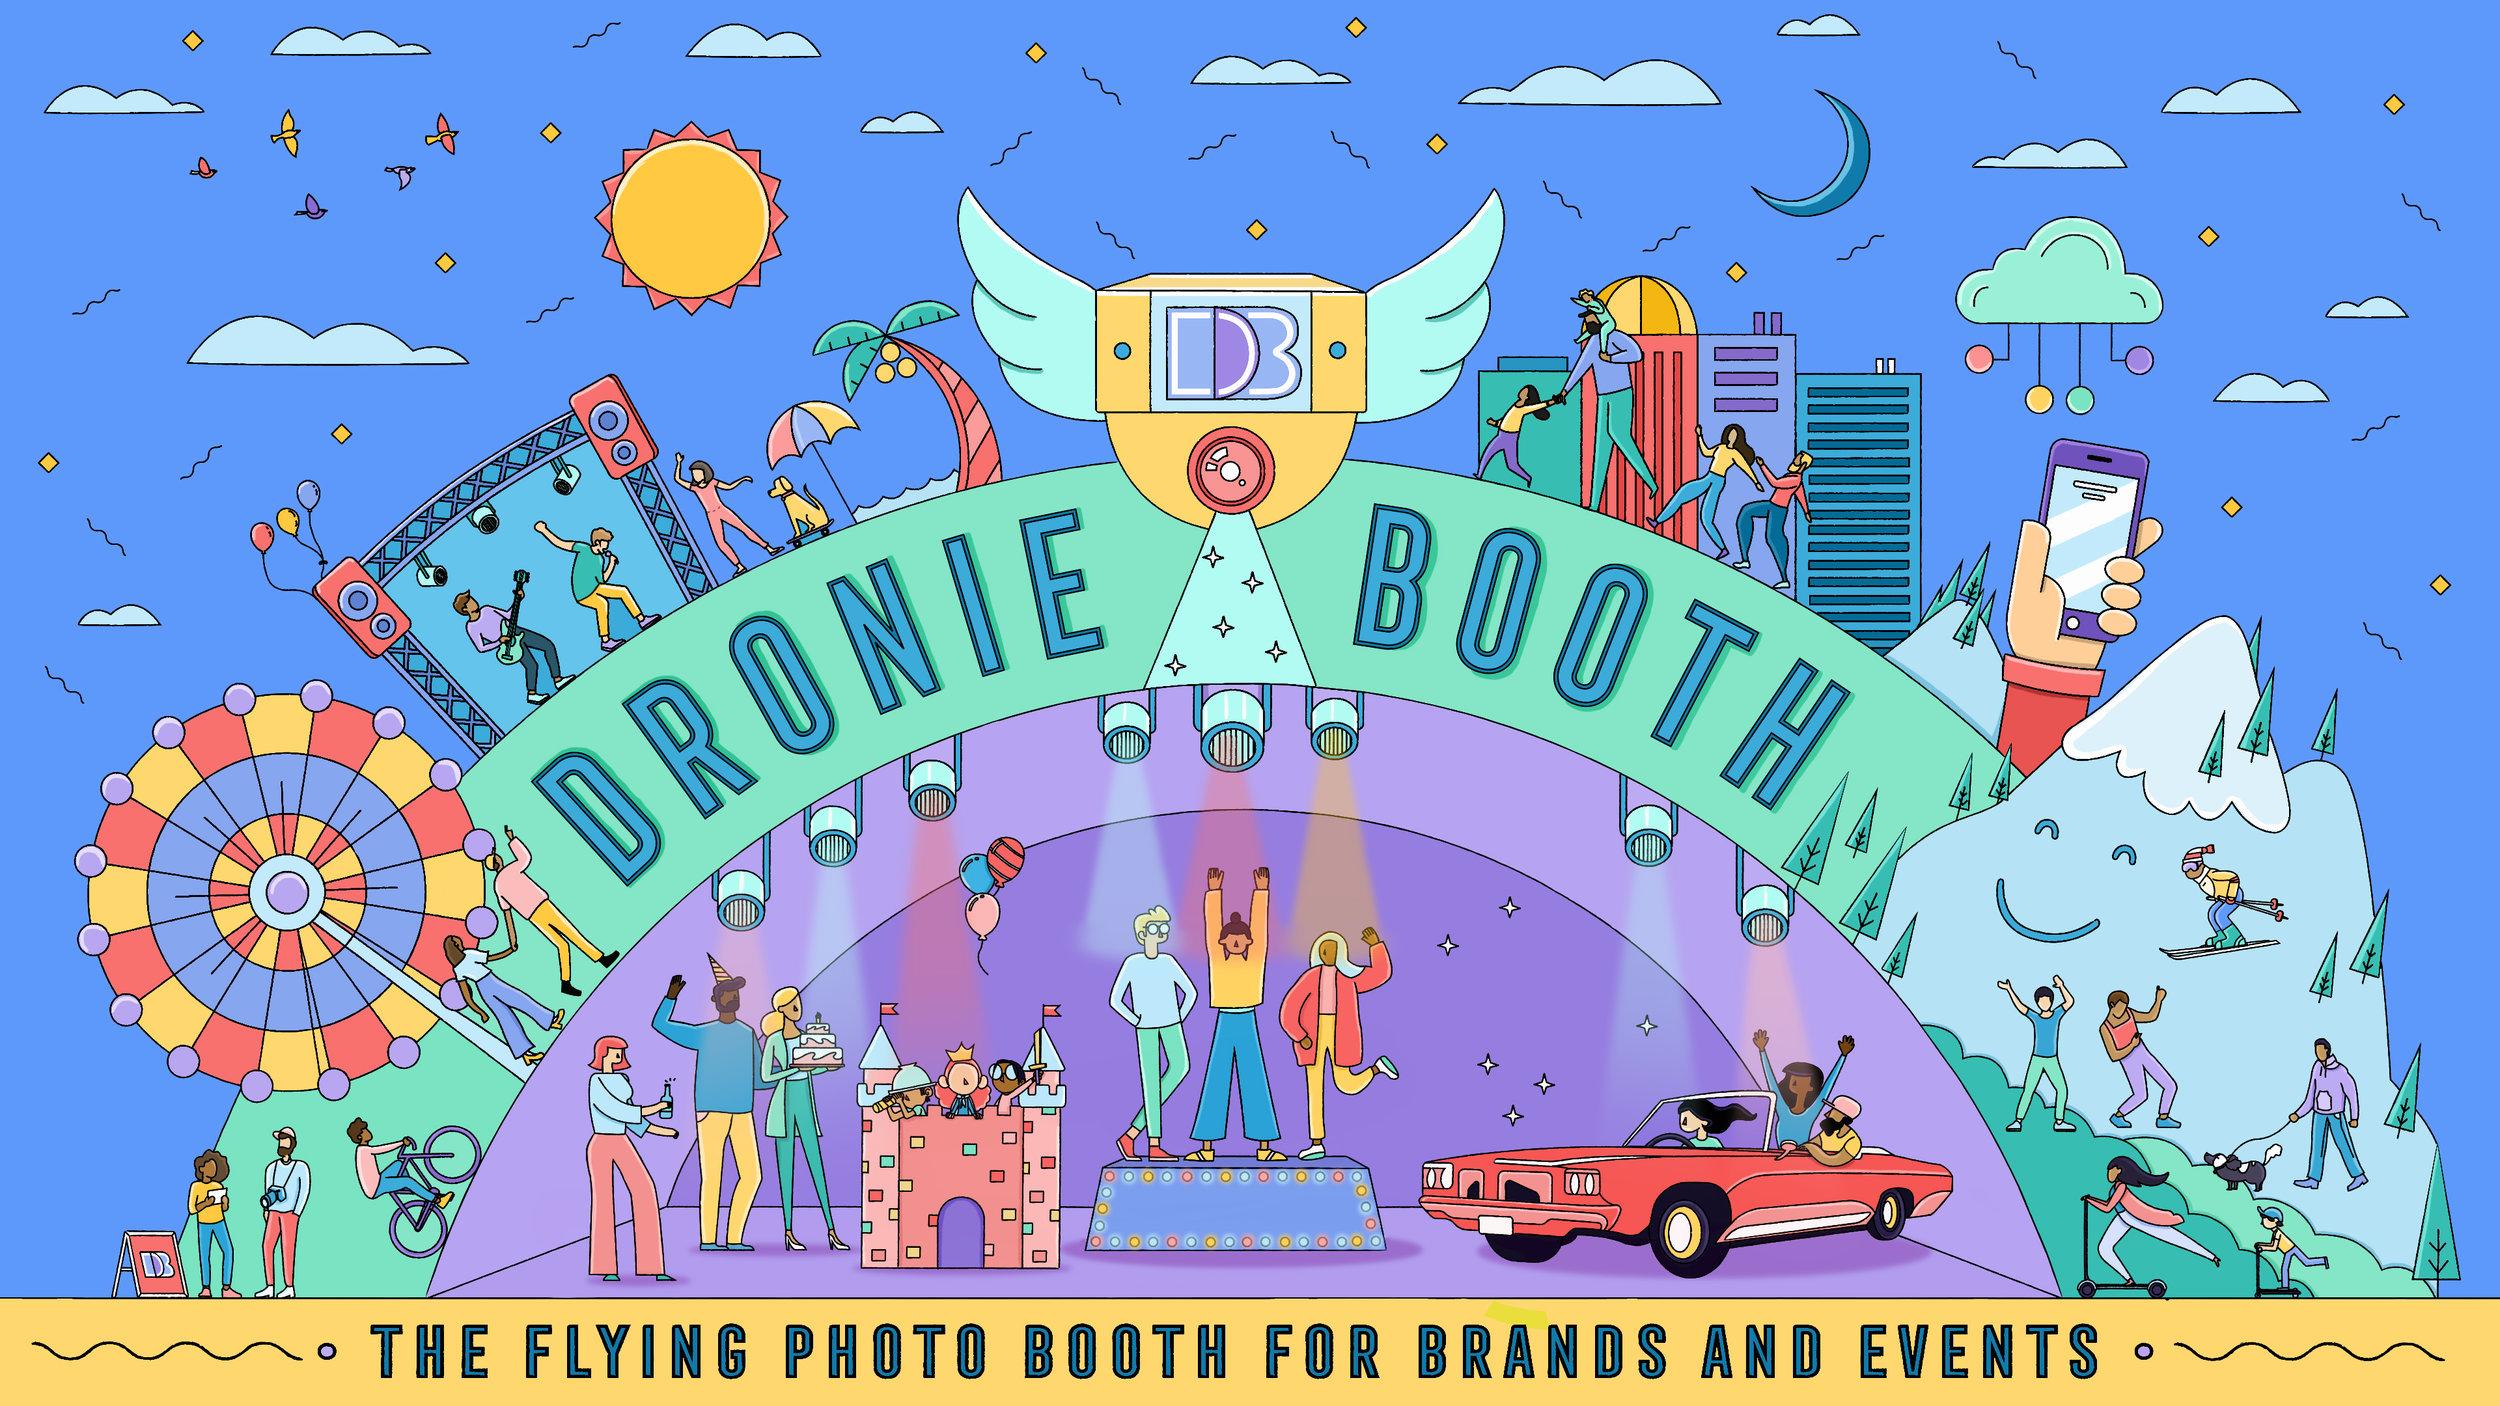 Dronie_Booth_Final_08.jpg